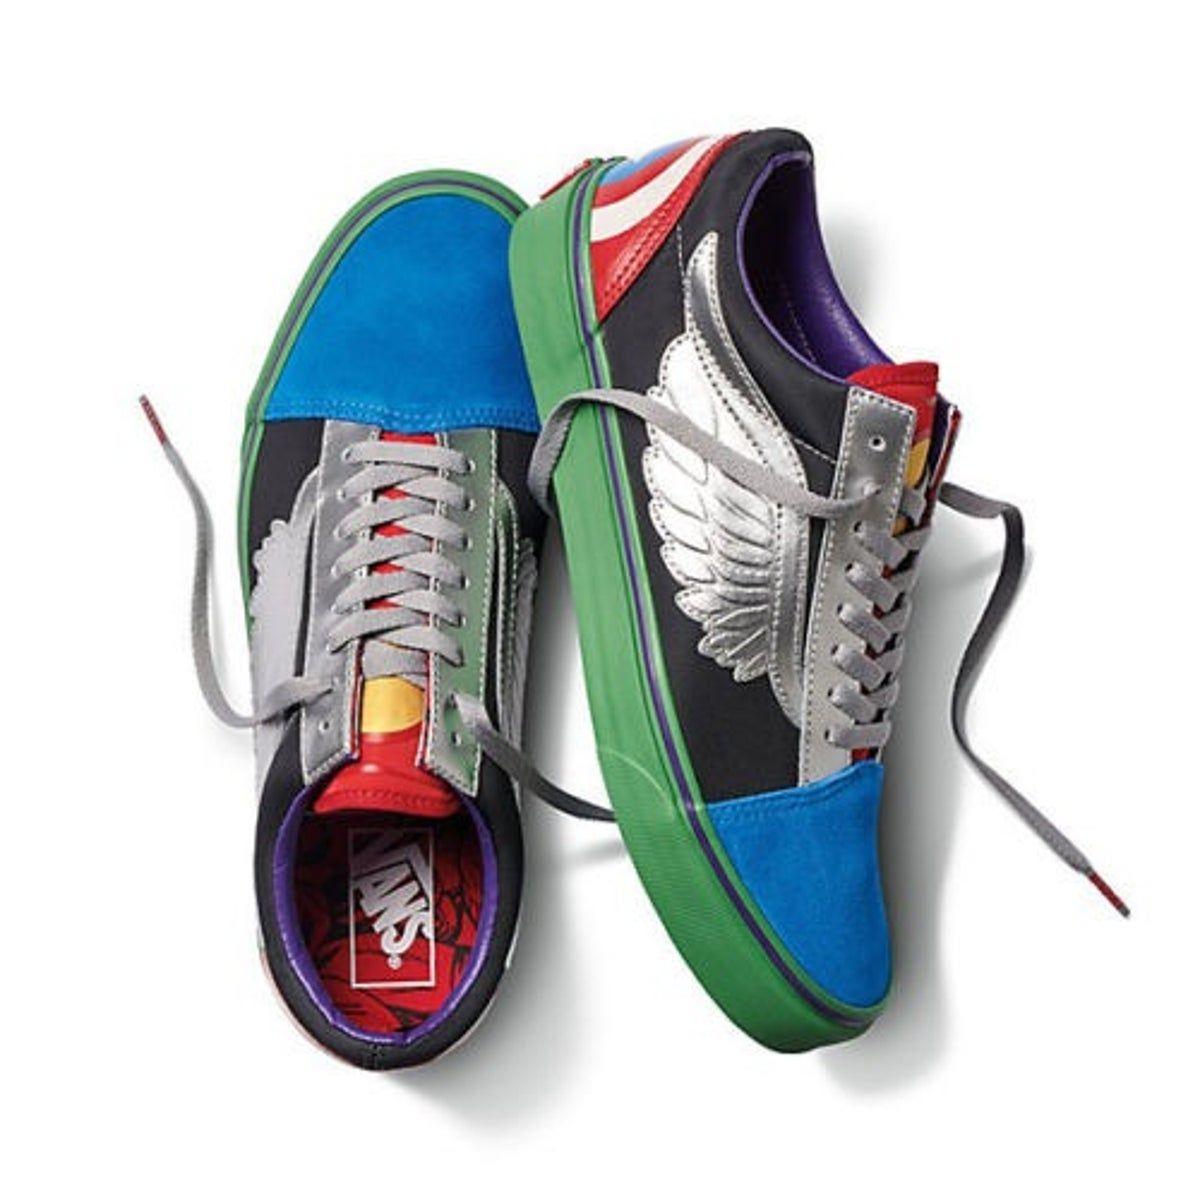 avengers tennis shoes